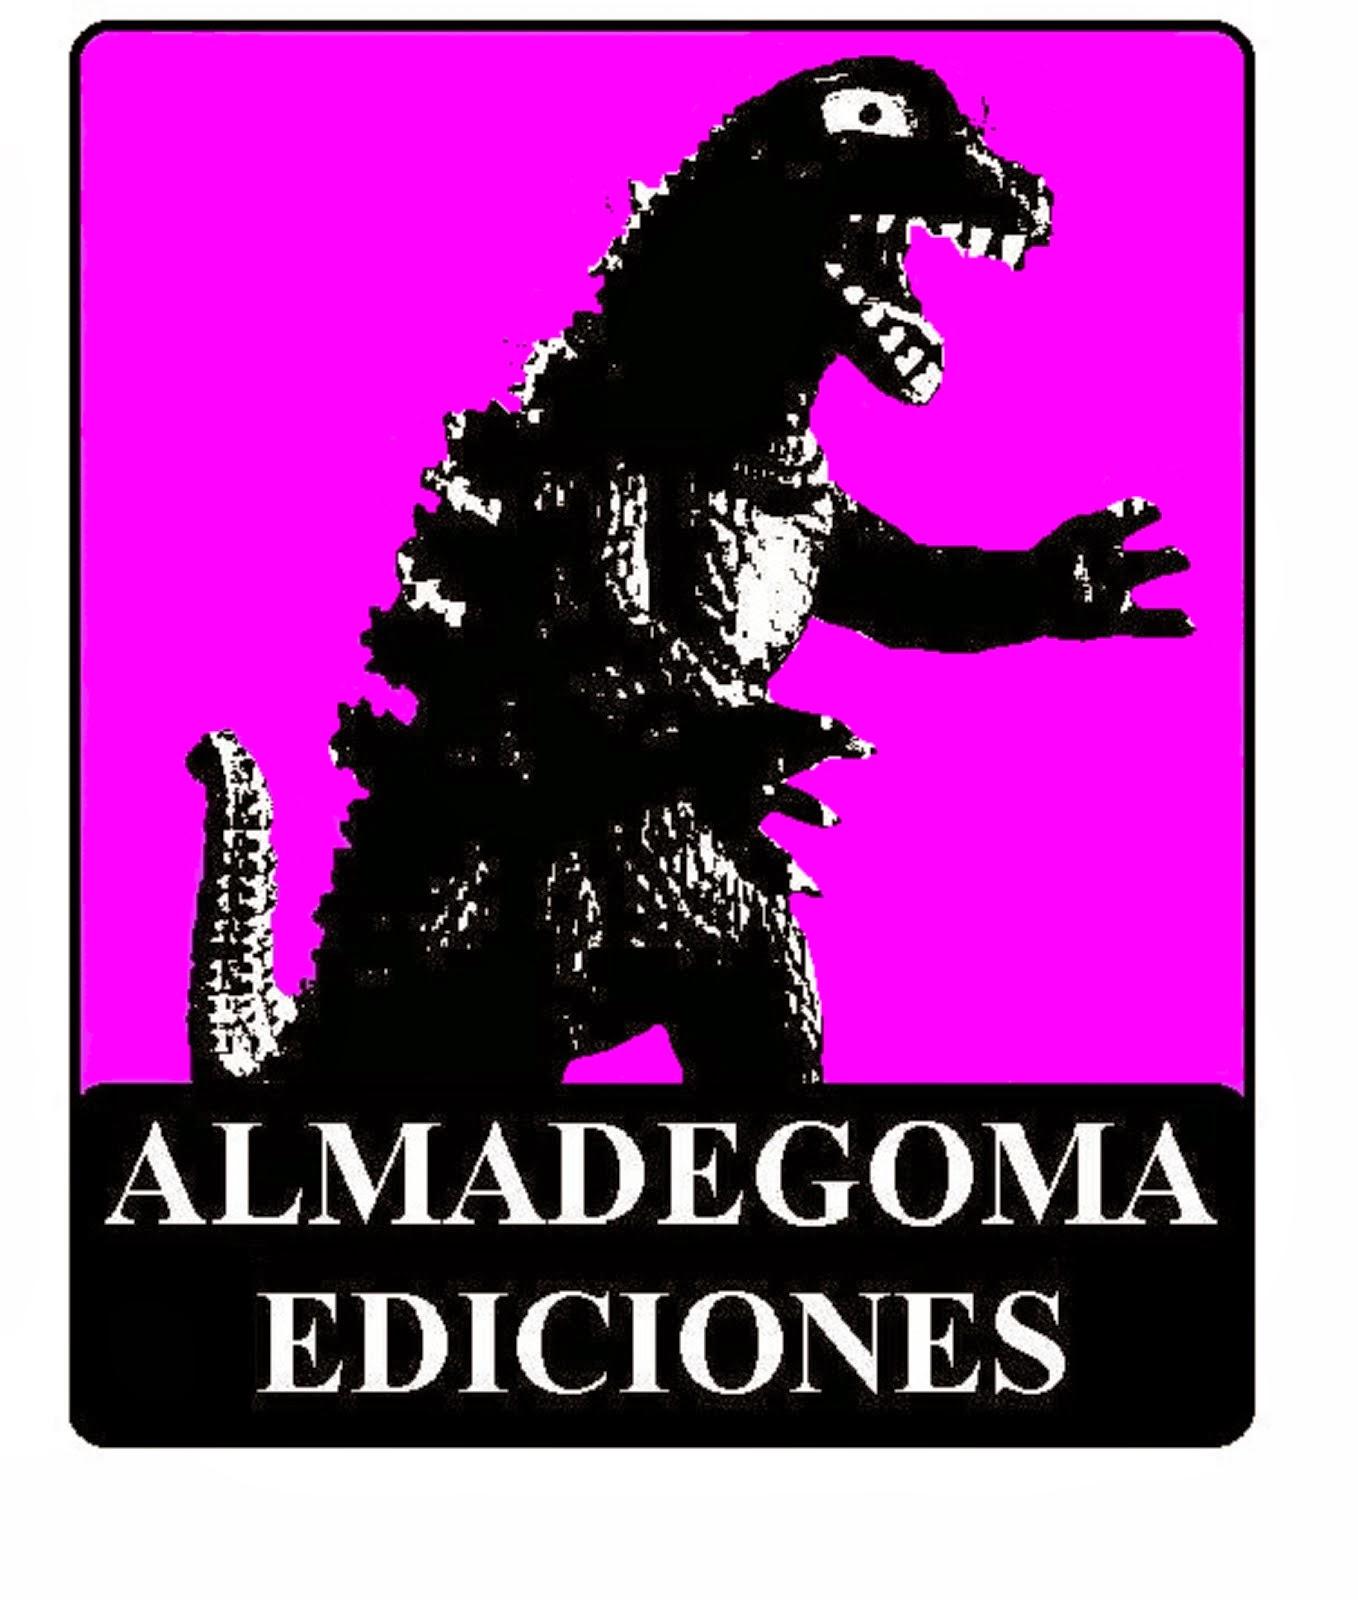 ALMADEGOMA EDICIONES